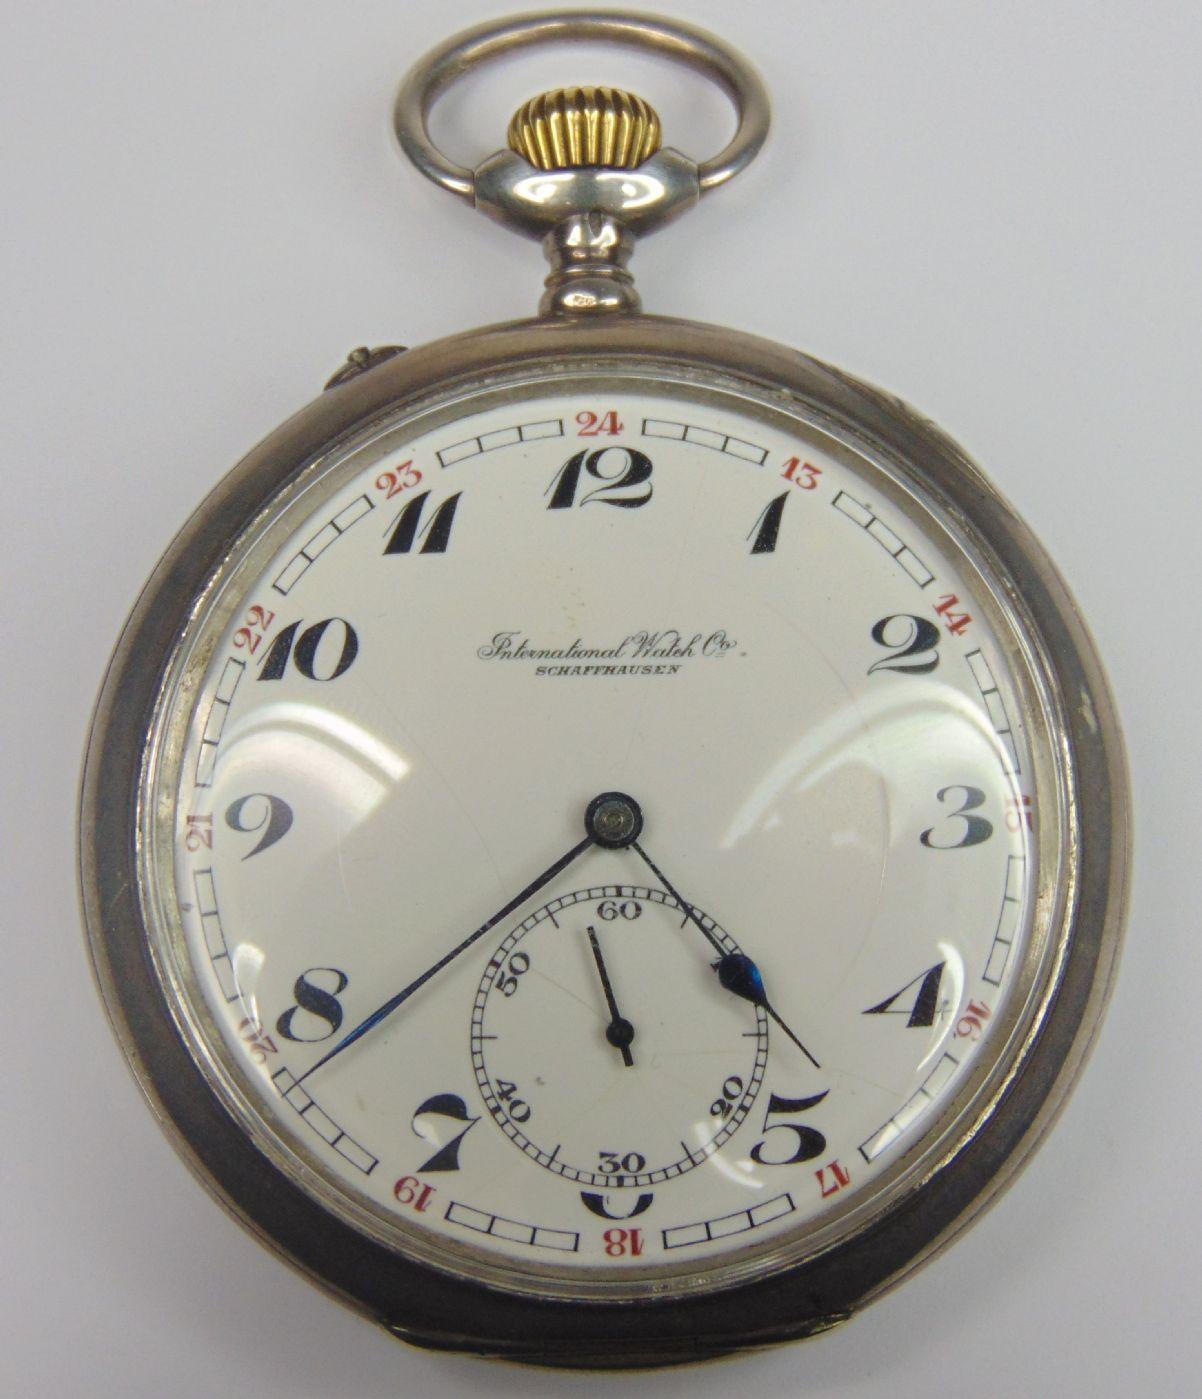 Orologio da tasca in argento International Watch Co. fine '800